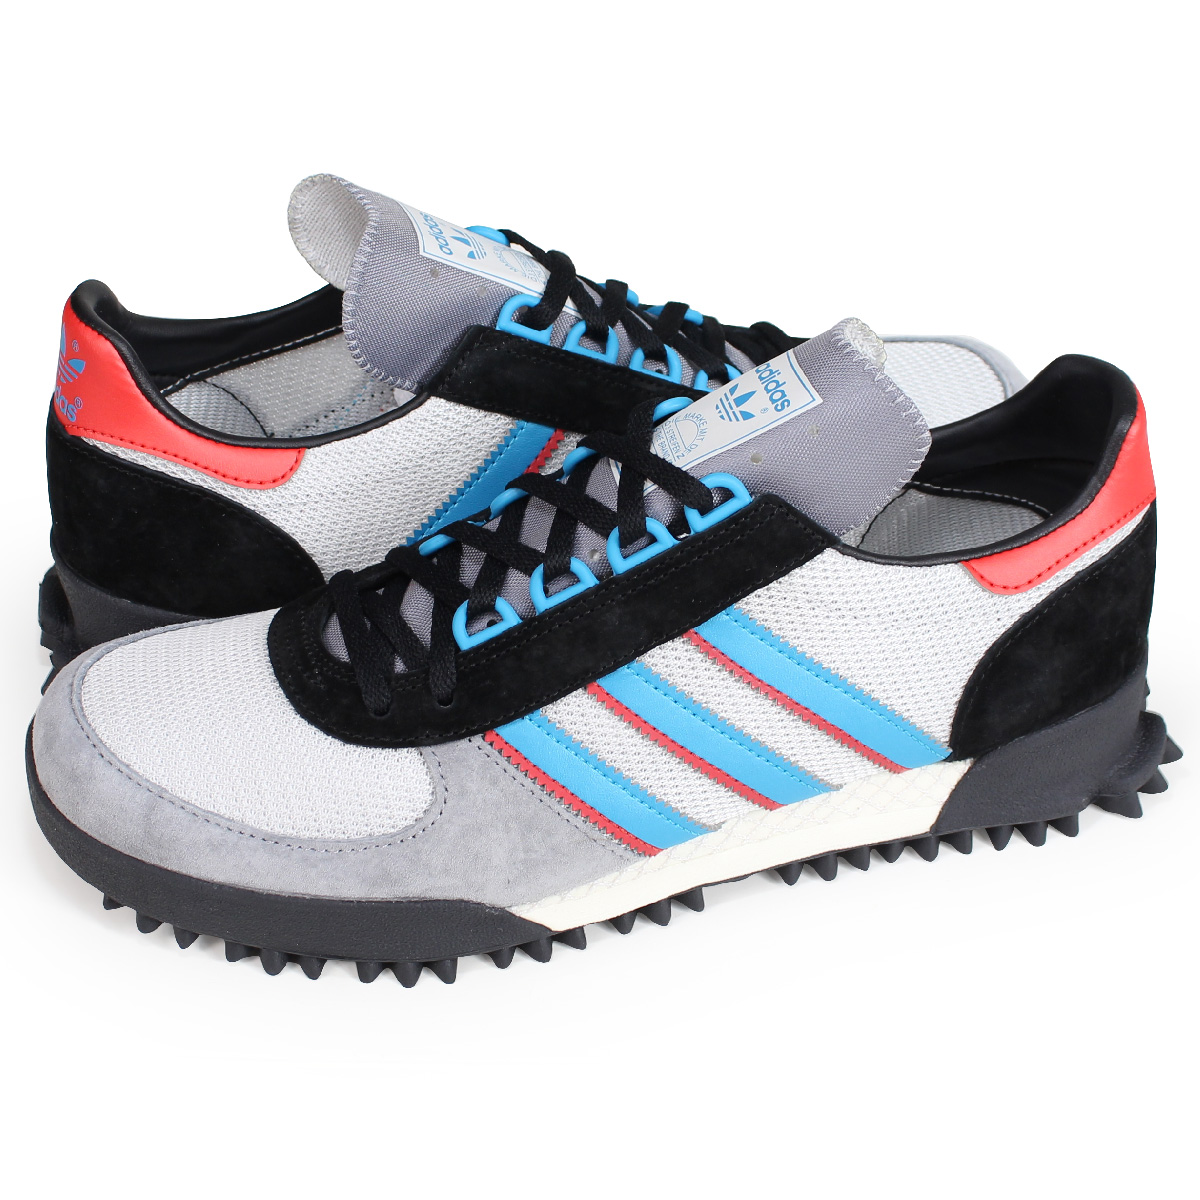 Details about Adidas Marathon TR Shoes Men Originals Casual Sneaker Mens Sport Running Shoes show original title